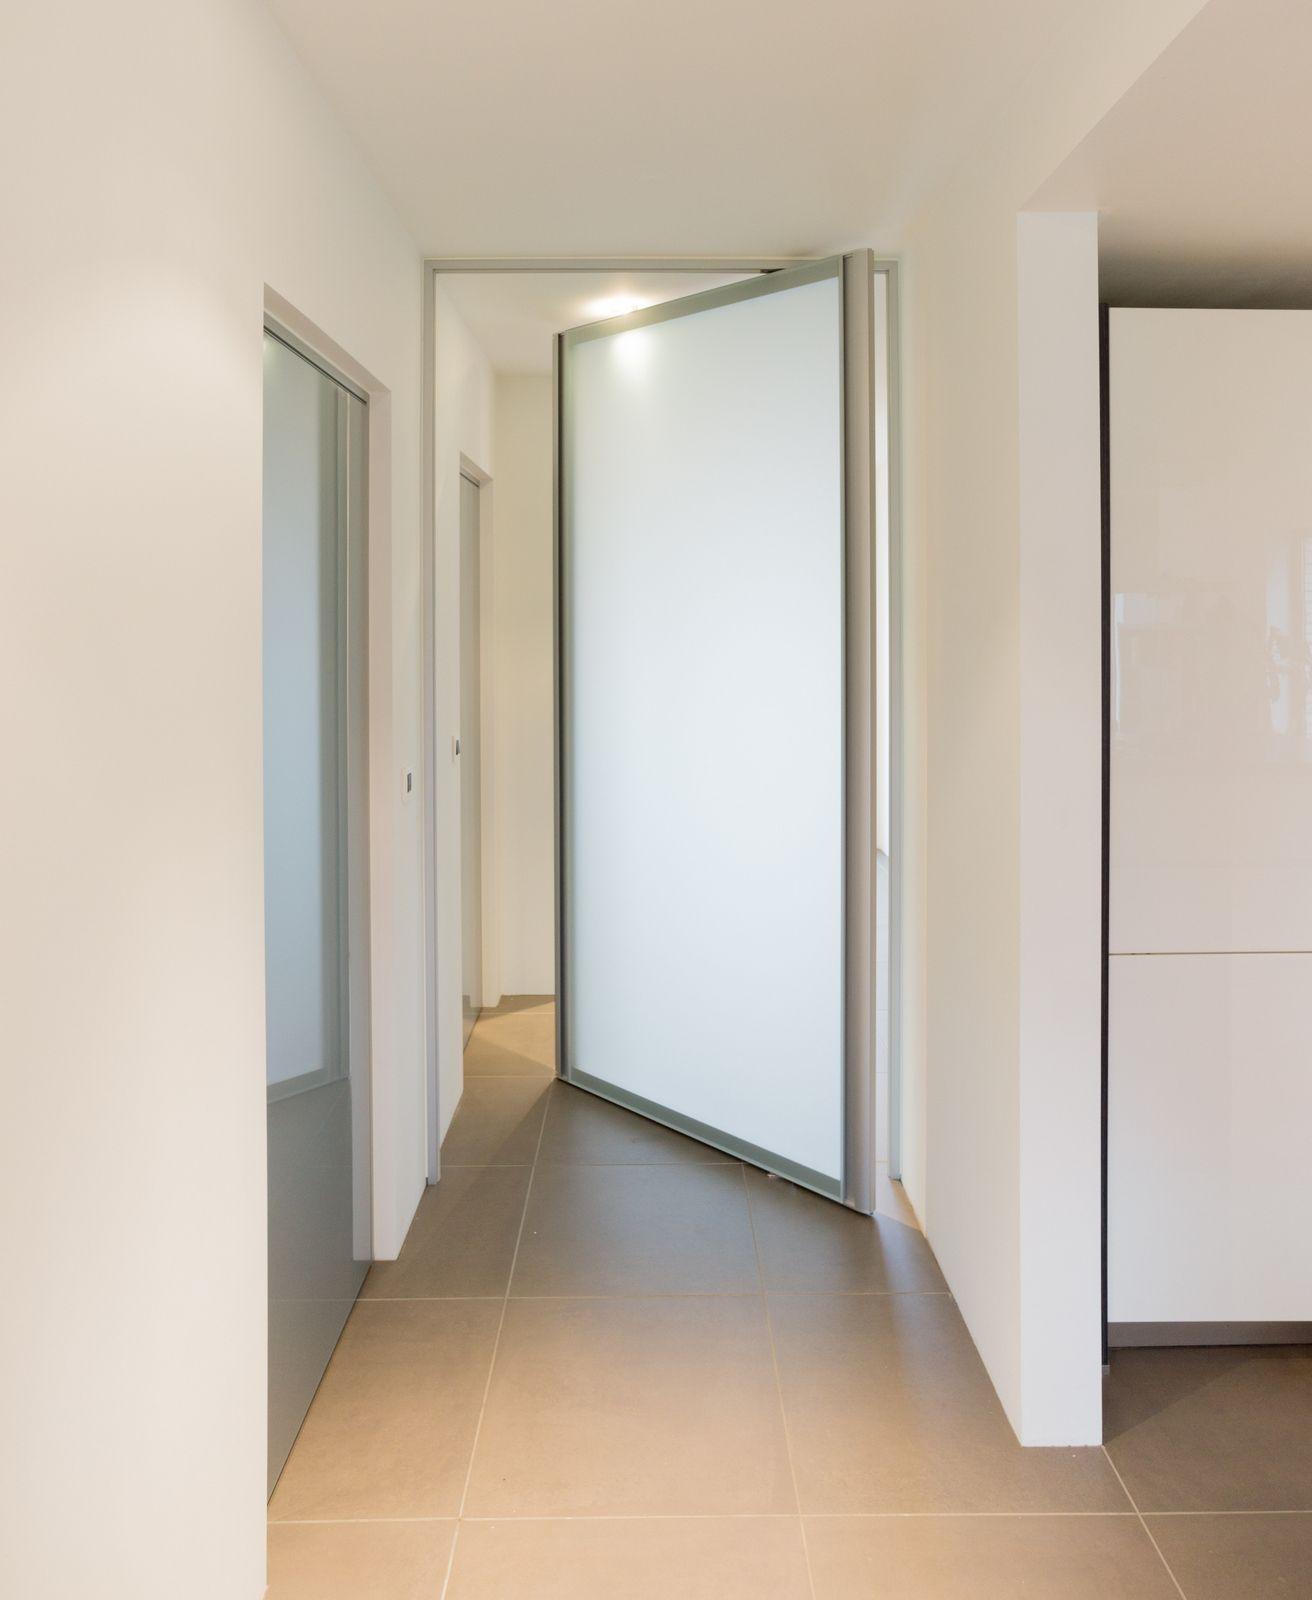 Modern Frosted Glass Pivot Door ARCHITECTURE Modernist To - Porte pivot